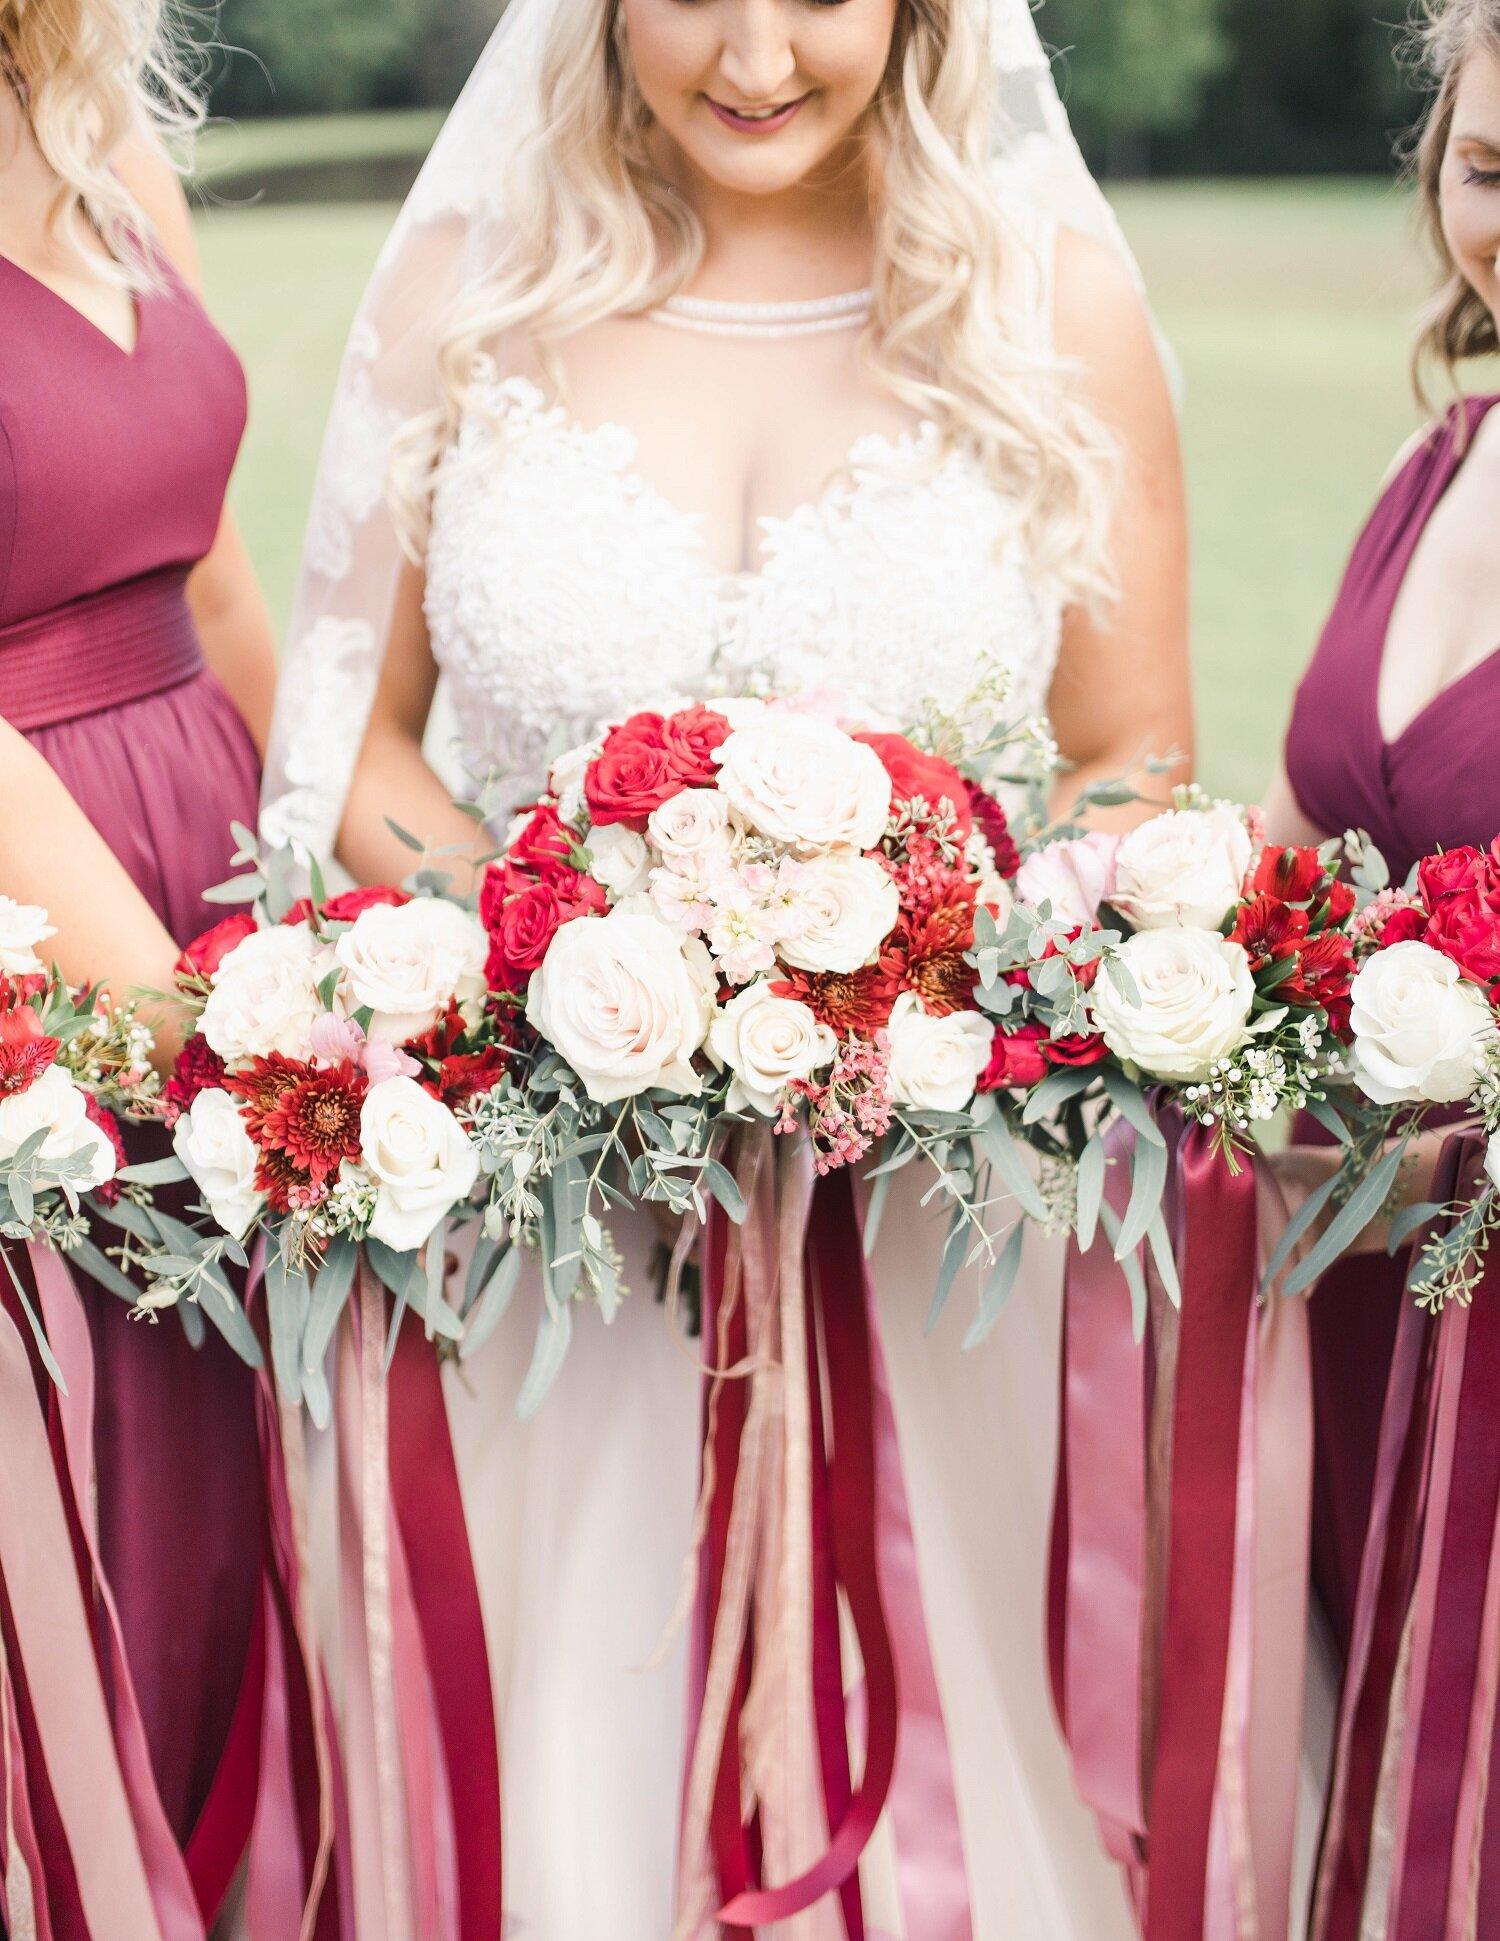 Martino Wedding - Shea's Favorites_-72.jpg